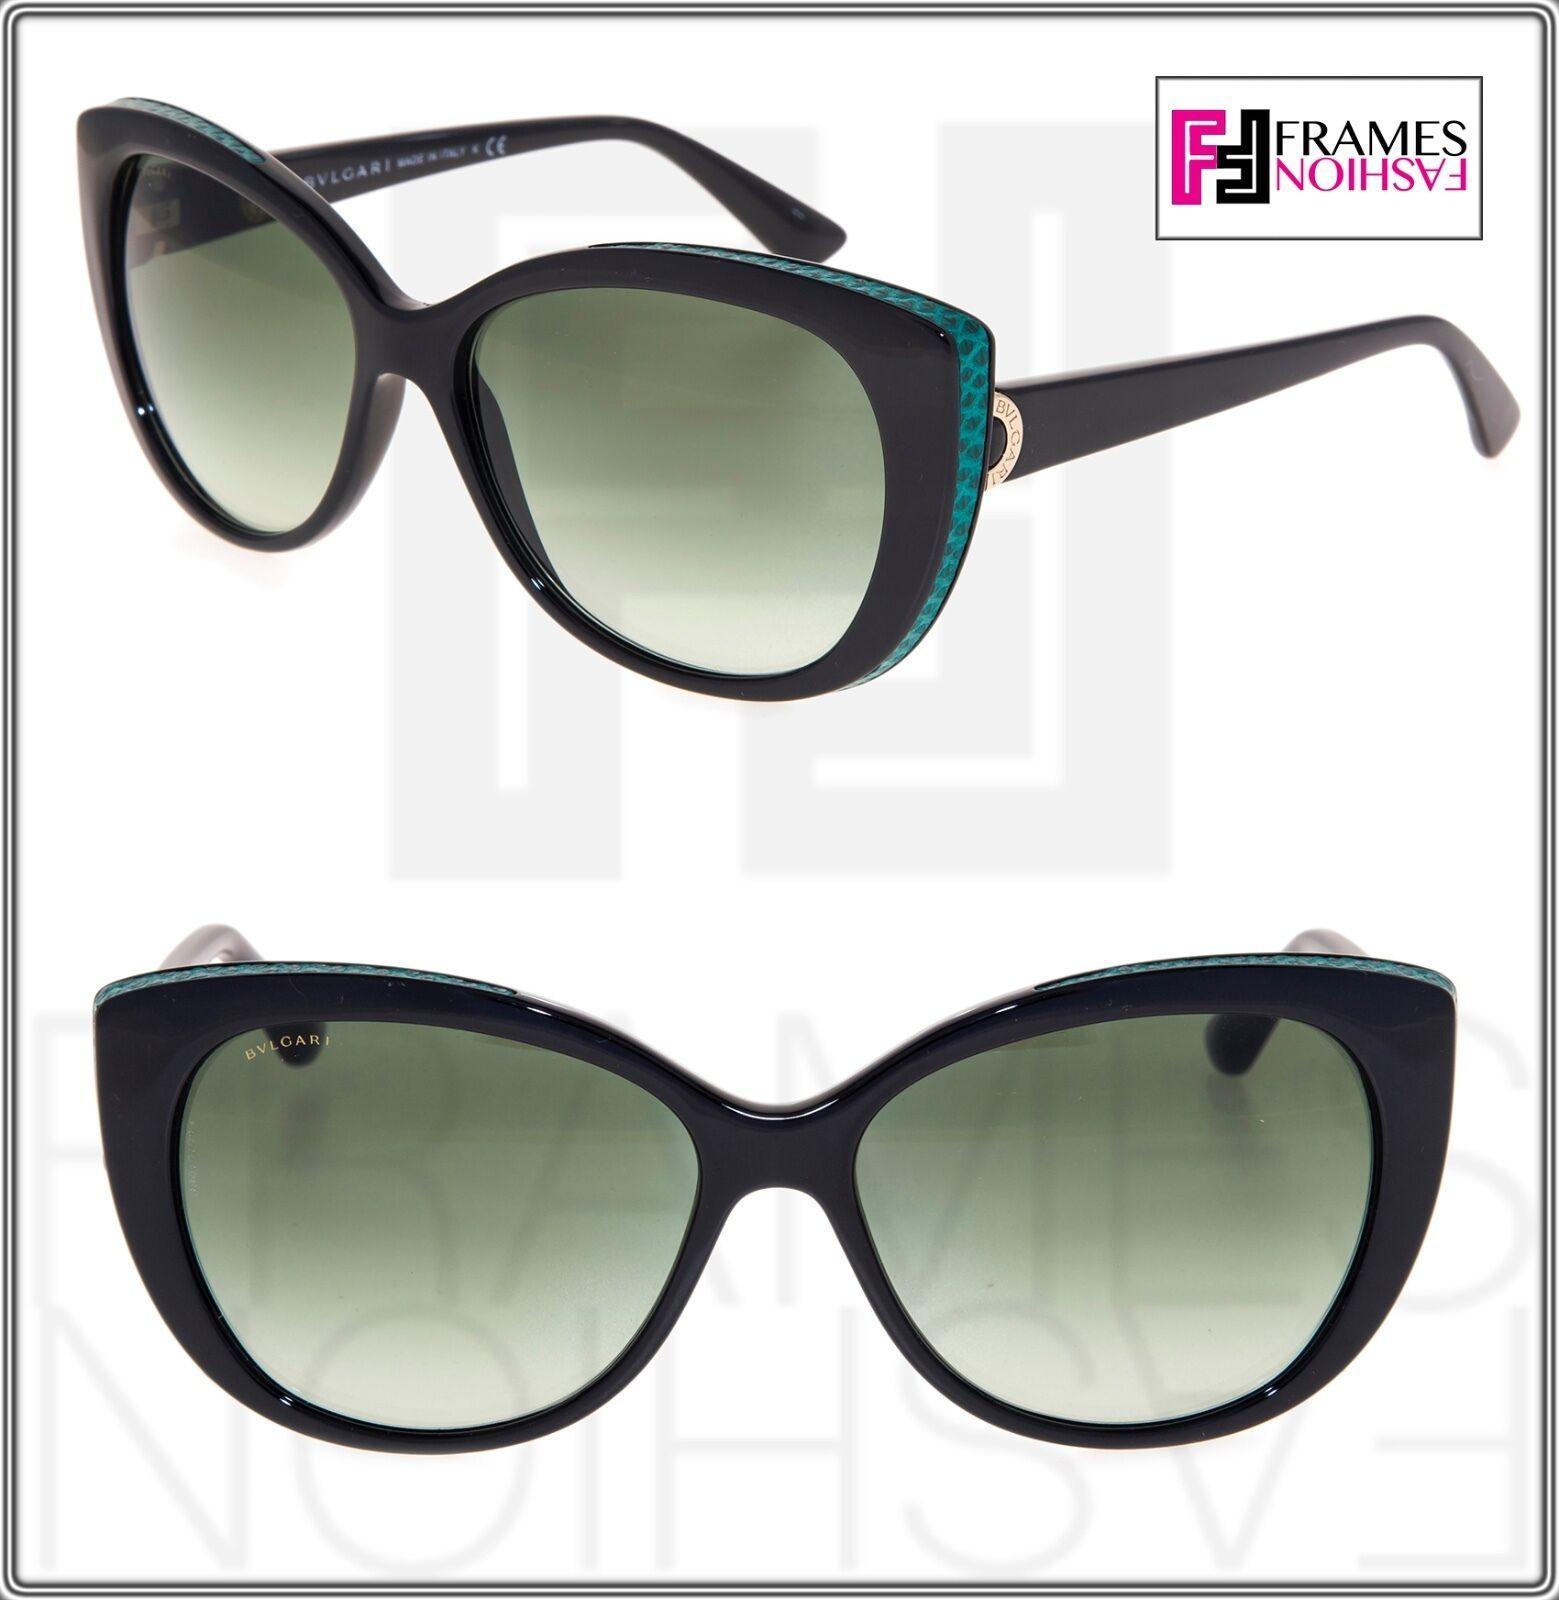 BVLGARI LOGO BV8169Q Black Green Leather Gradient Cat Eye Sunglasses Gold 8169